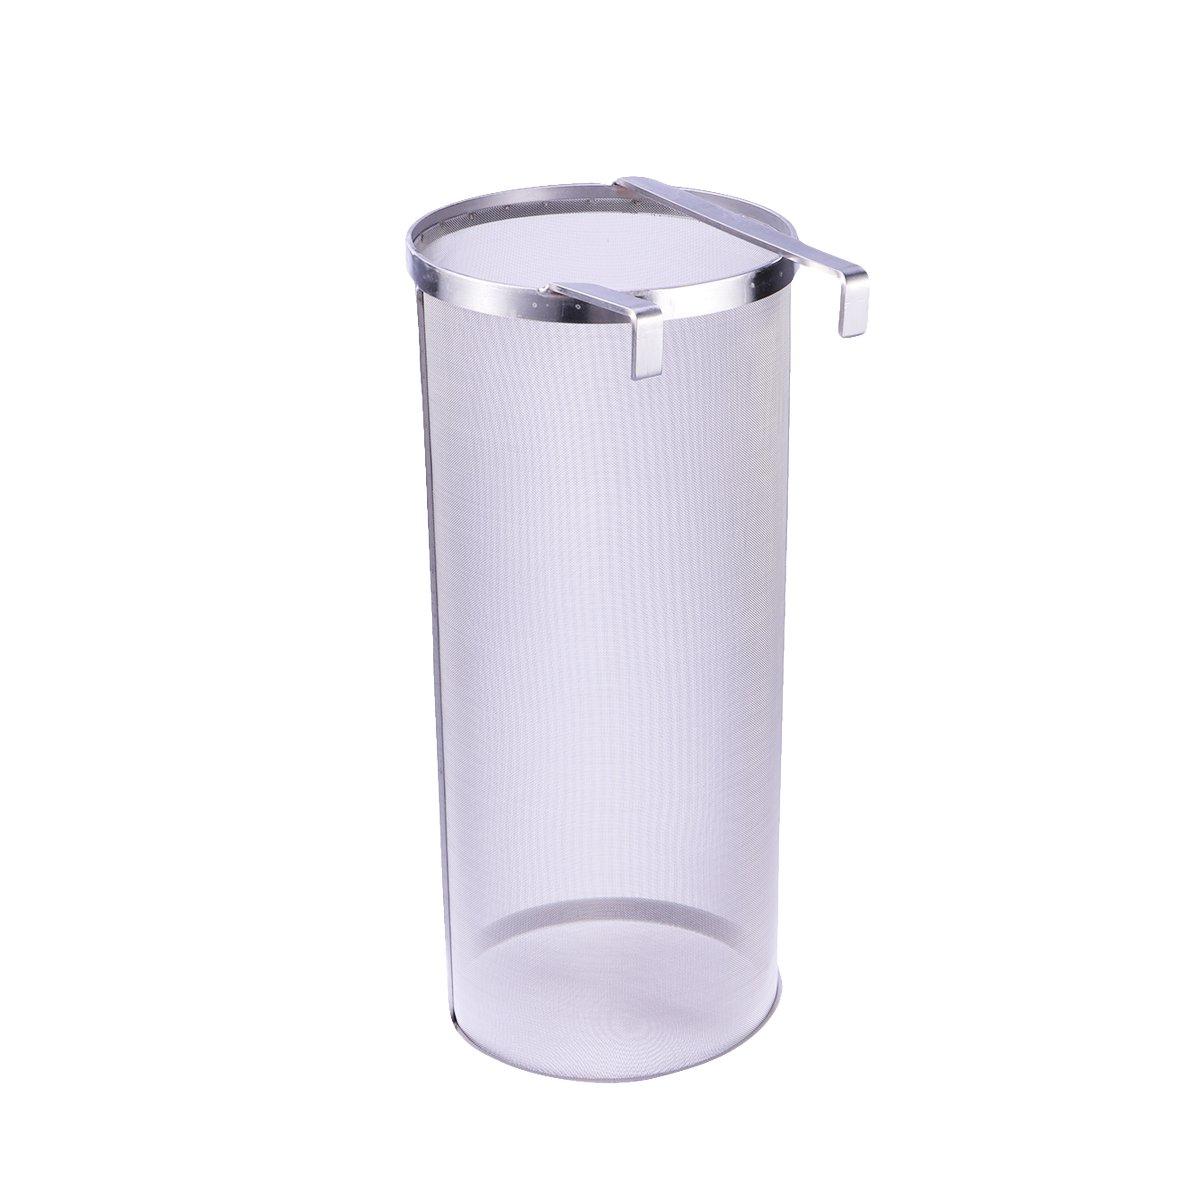 BESTONZON Stainless Steel Hop Filter Strainer Mesh Hopper Strainer for Home Beer Brewing Kettle (6 x 14inch)